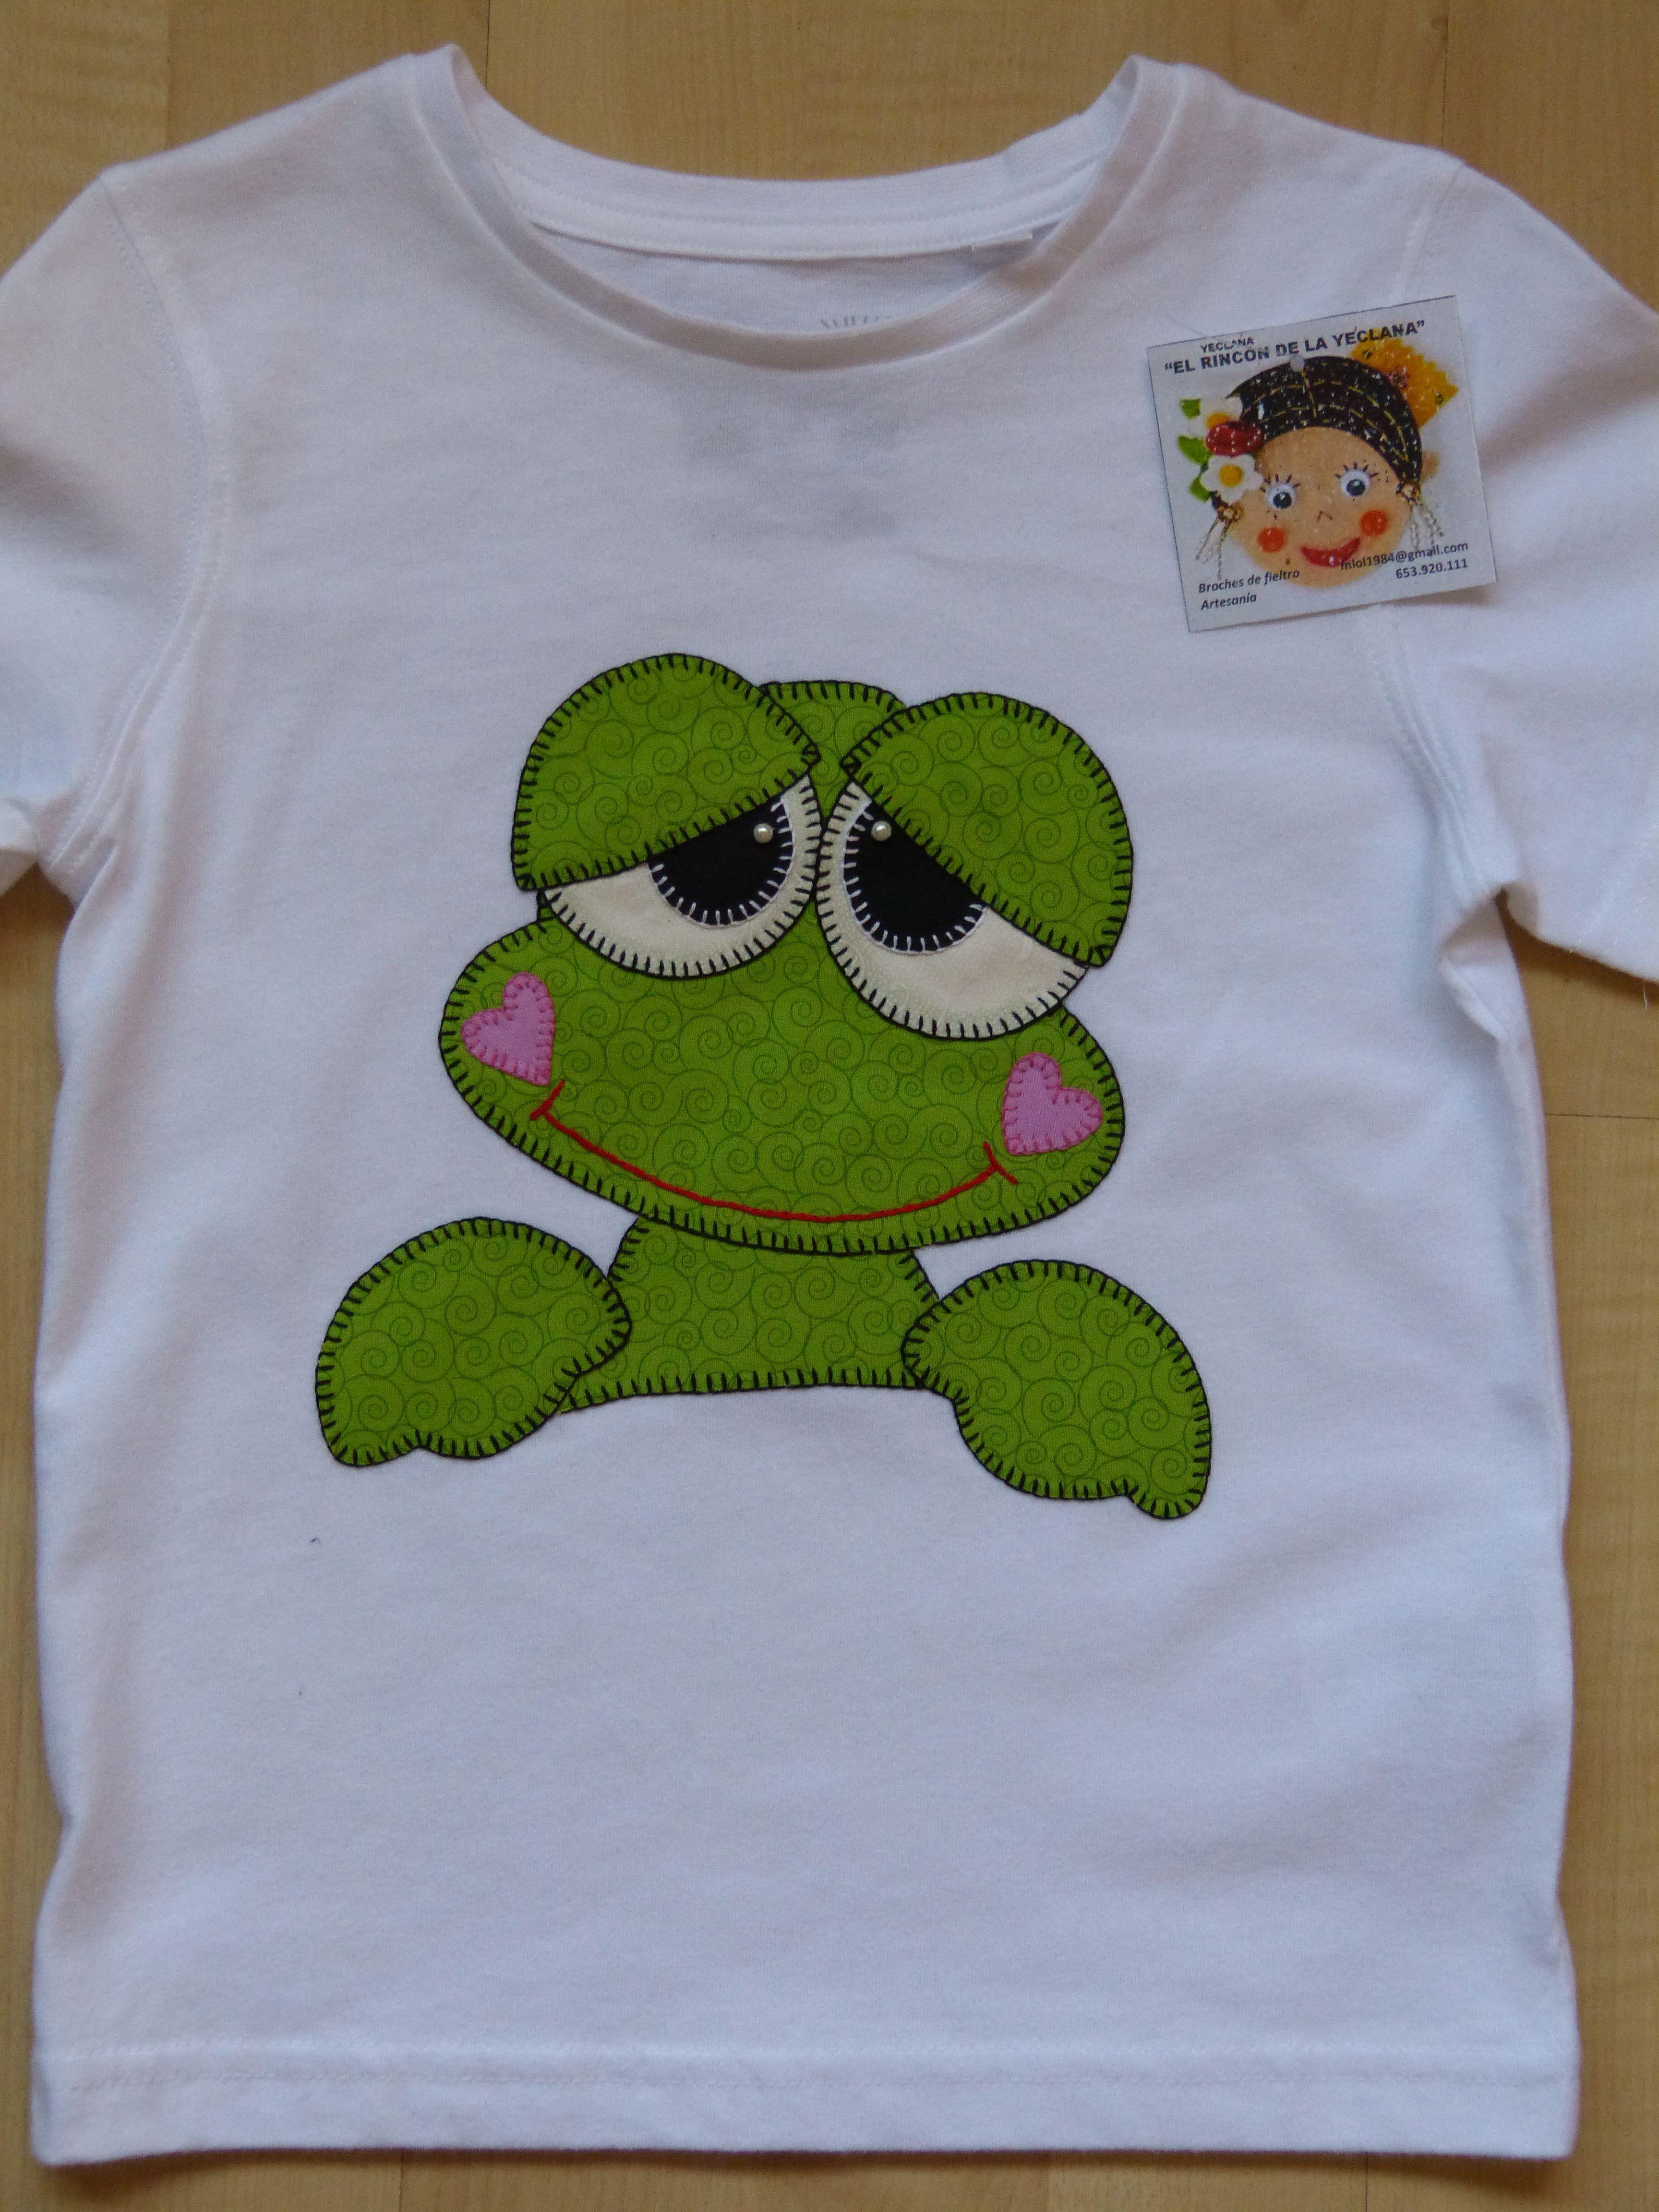 Patch applique camisetas pinterest camisetas for Aplicaciones decoradas